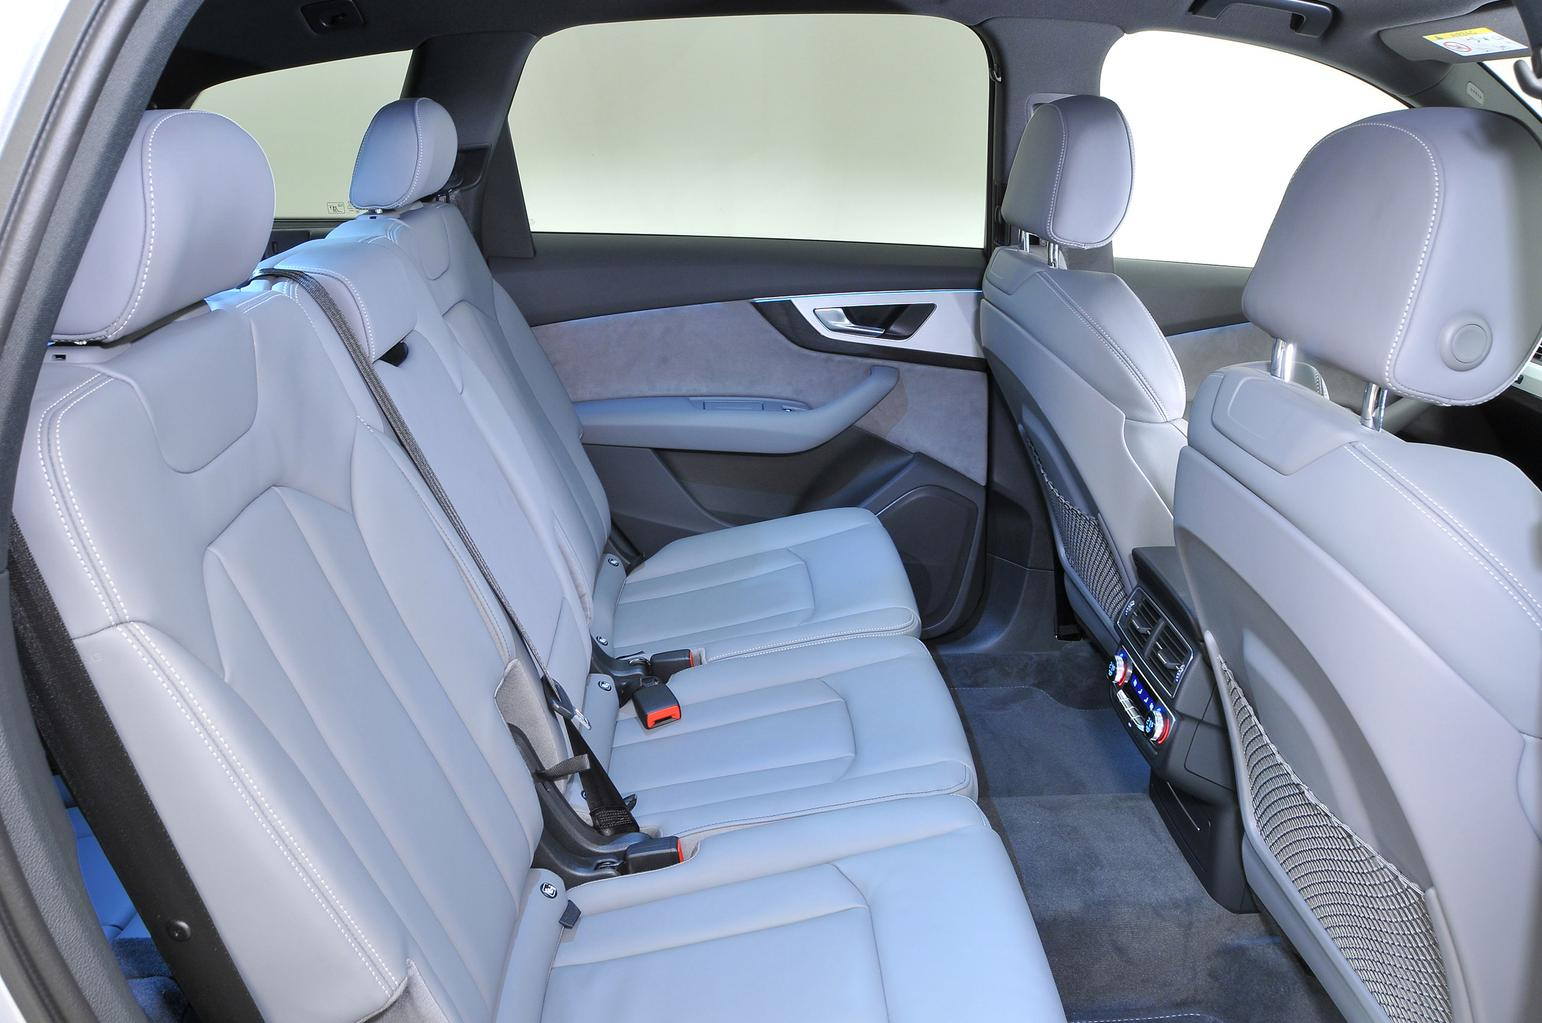 10 reasons to buy an Audi Q7